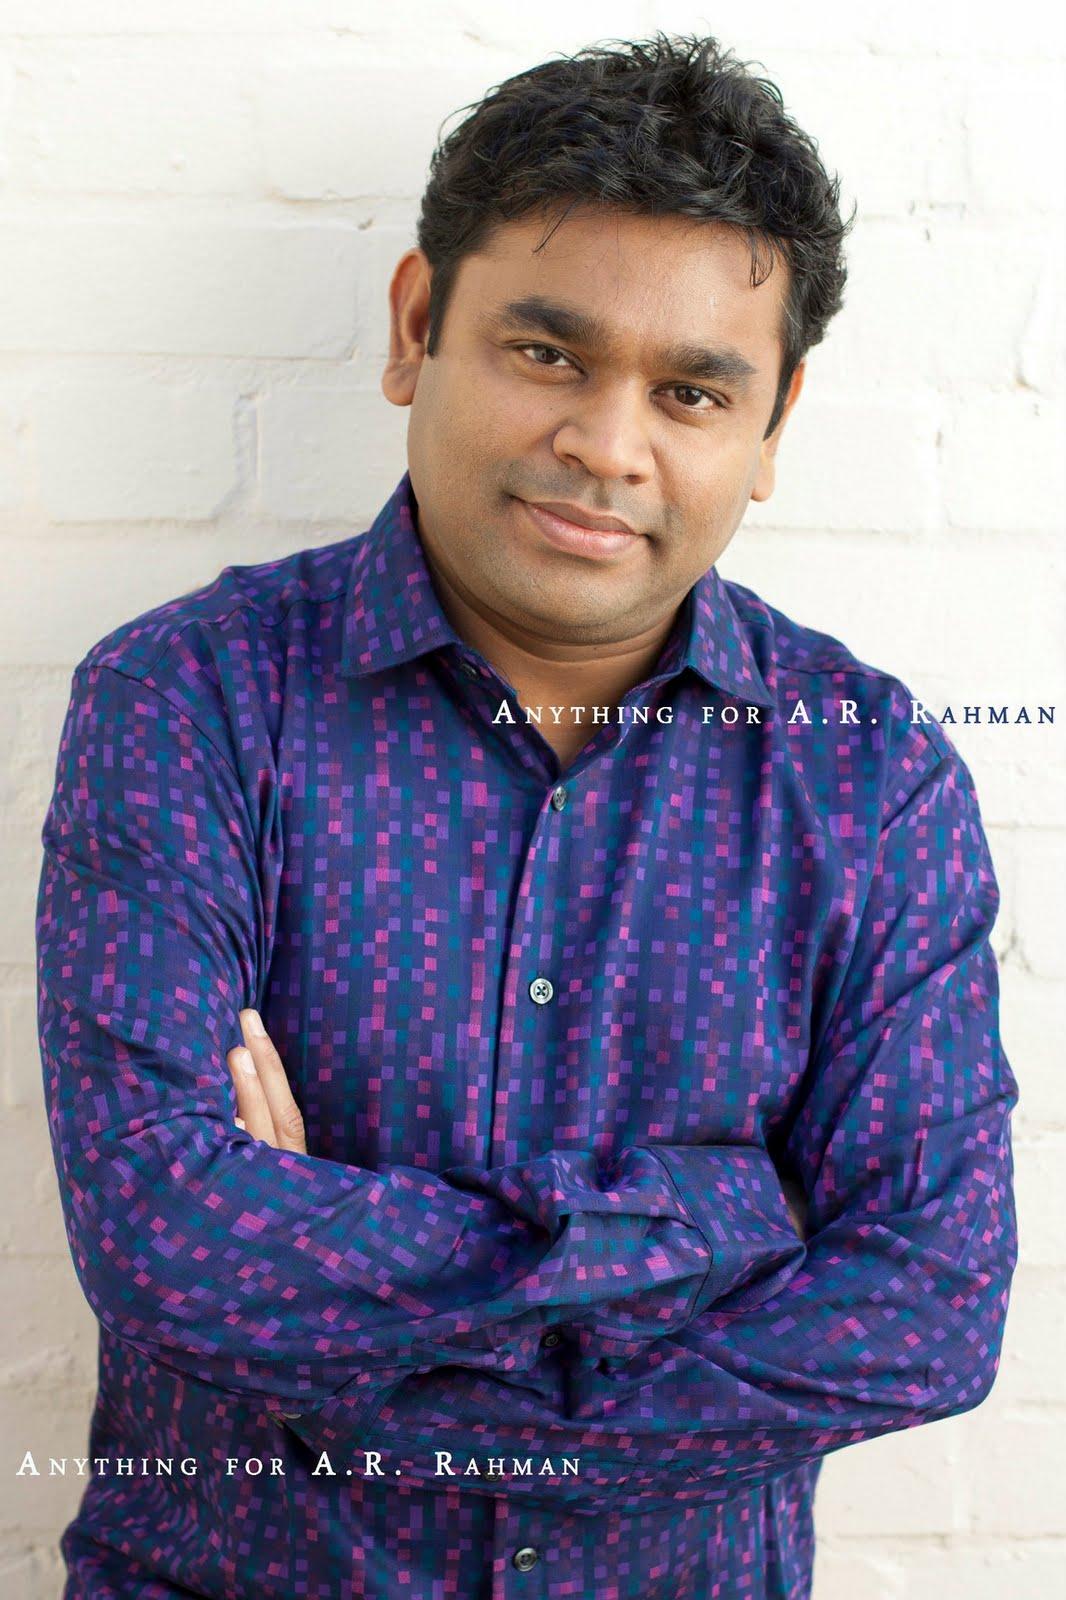 A R Rahman discography  Wikipedia